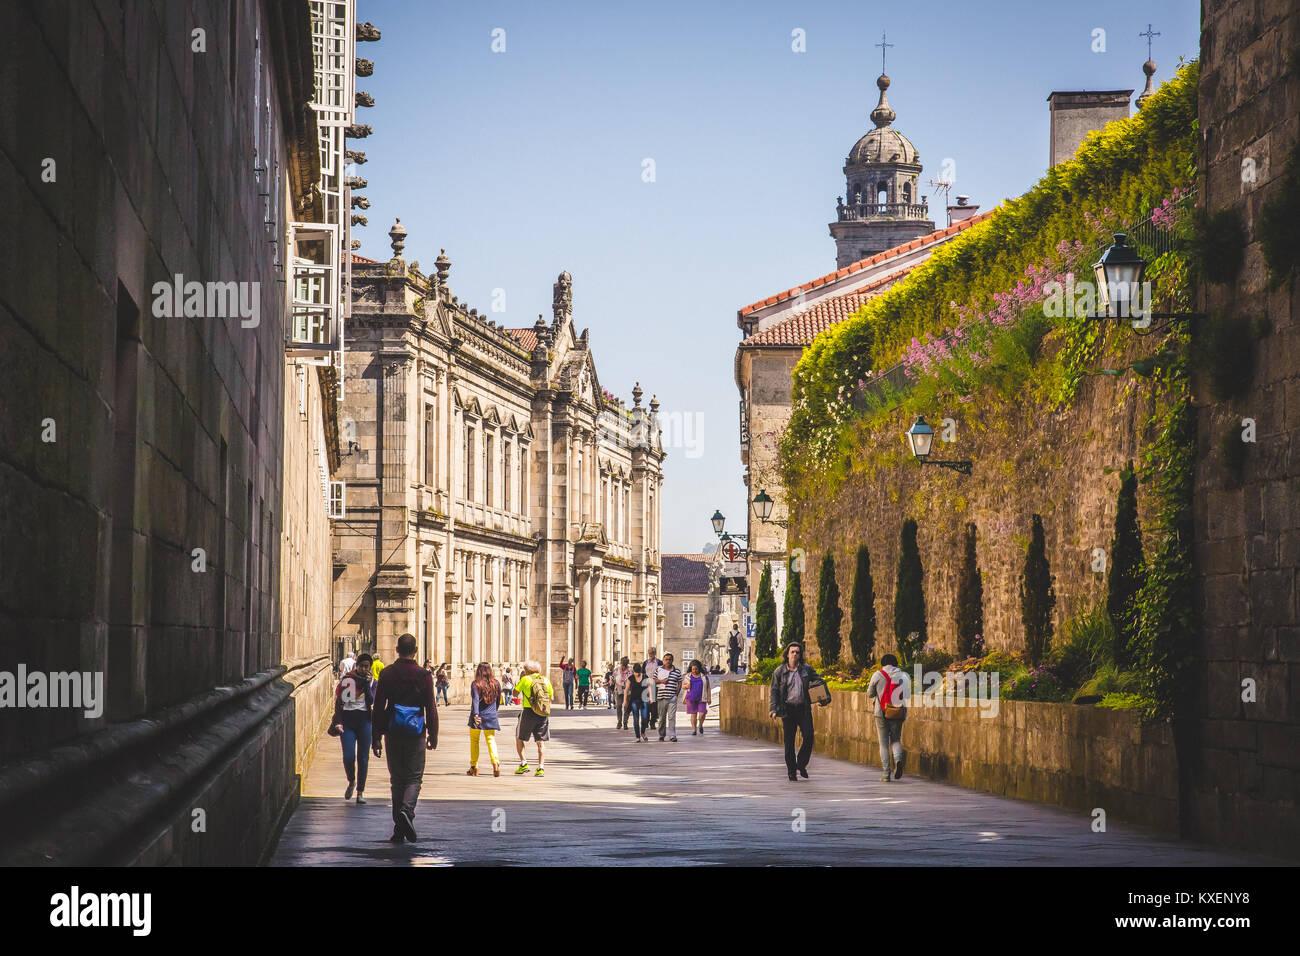 Monument and street of Santiago de Compostela. Spain - Stock Image